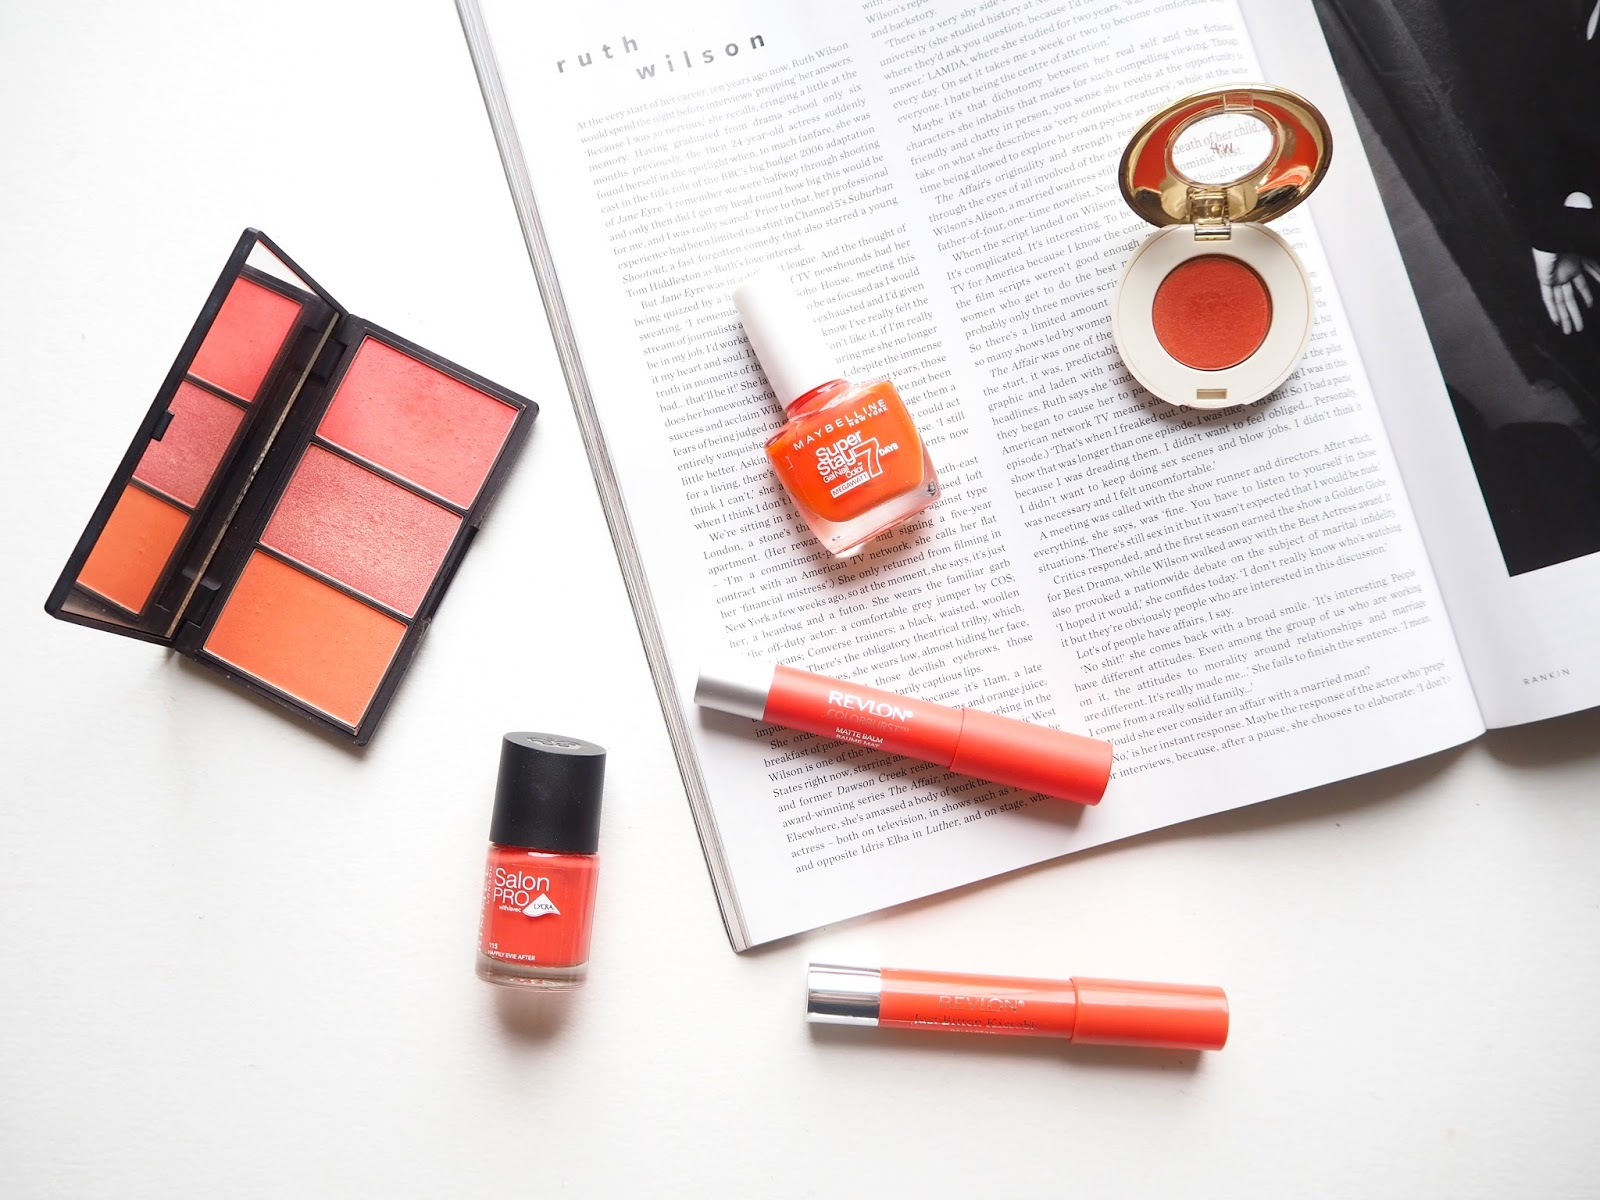 All About Orange, orange makeup, blush, lipstick, eyeshadow, nail polish, sleek lace, rimmel happily evie after, rimmel audacious, rimmel rendezvous, maybelline orange punch, review